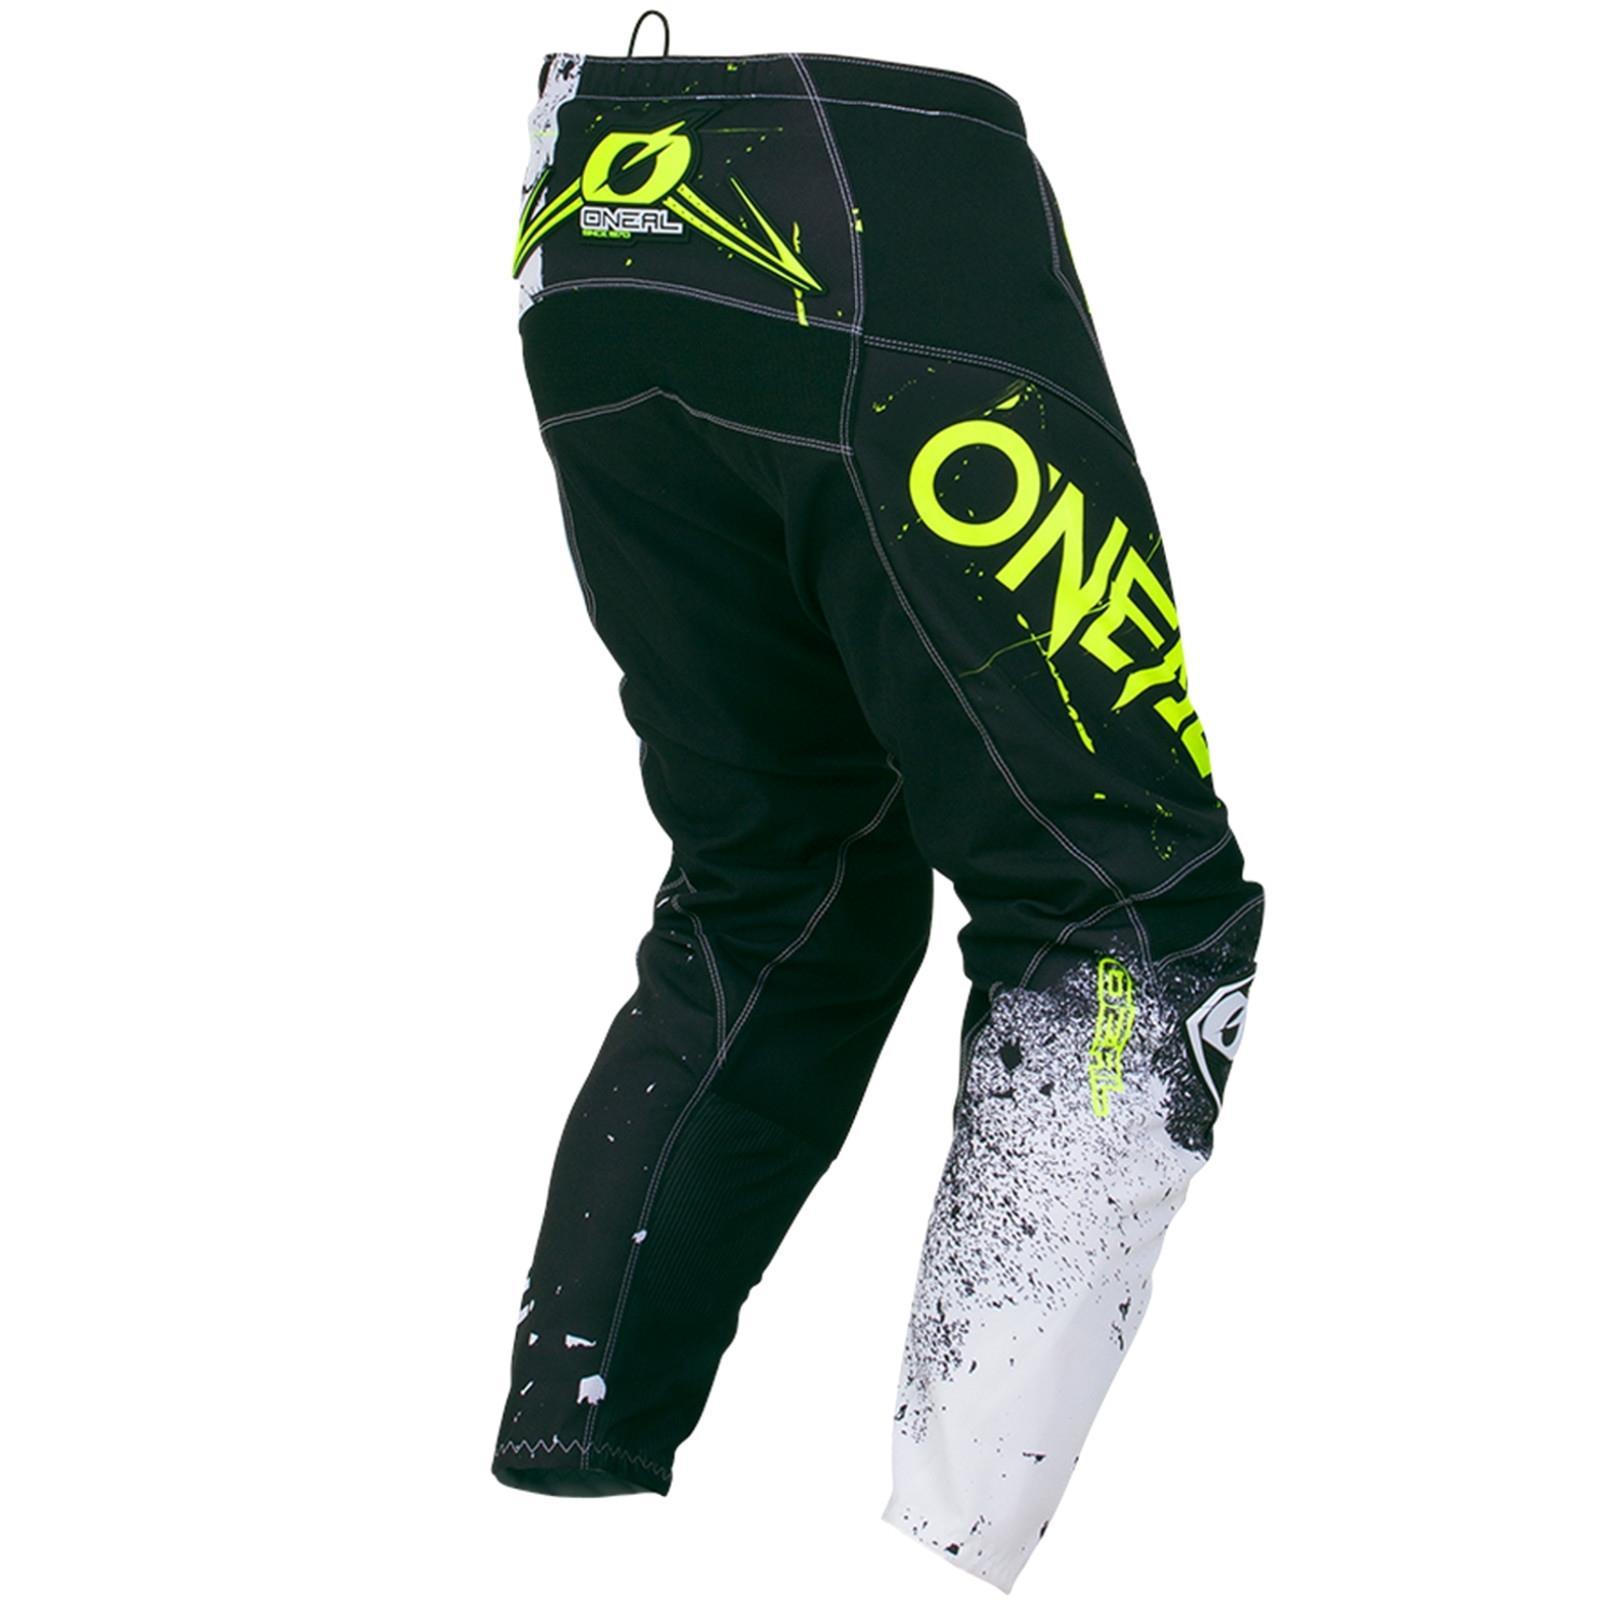 ONeal-pantalones-de-Jersey-de-los-ninos-de-pantalones-cortos-ninos-MX-bicicleta-DH-montana-bicicleta miniatura 123